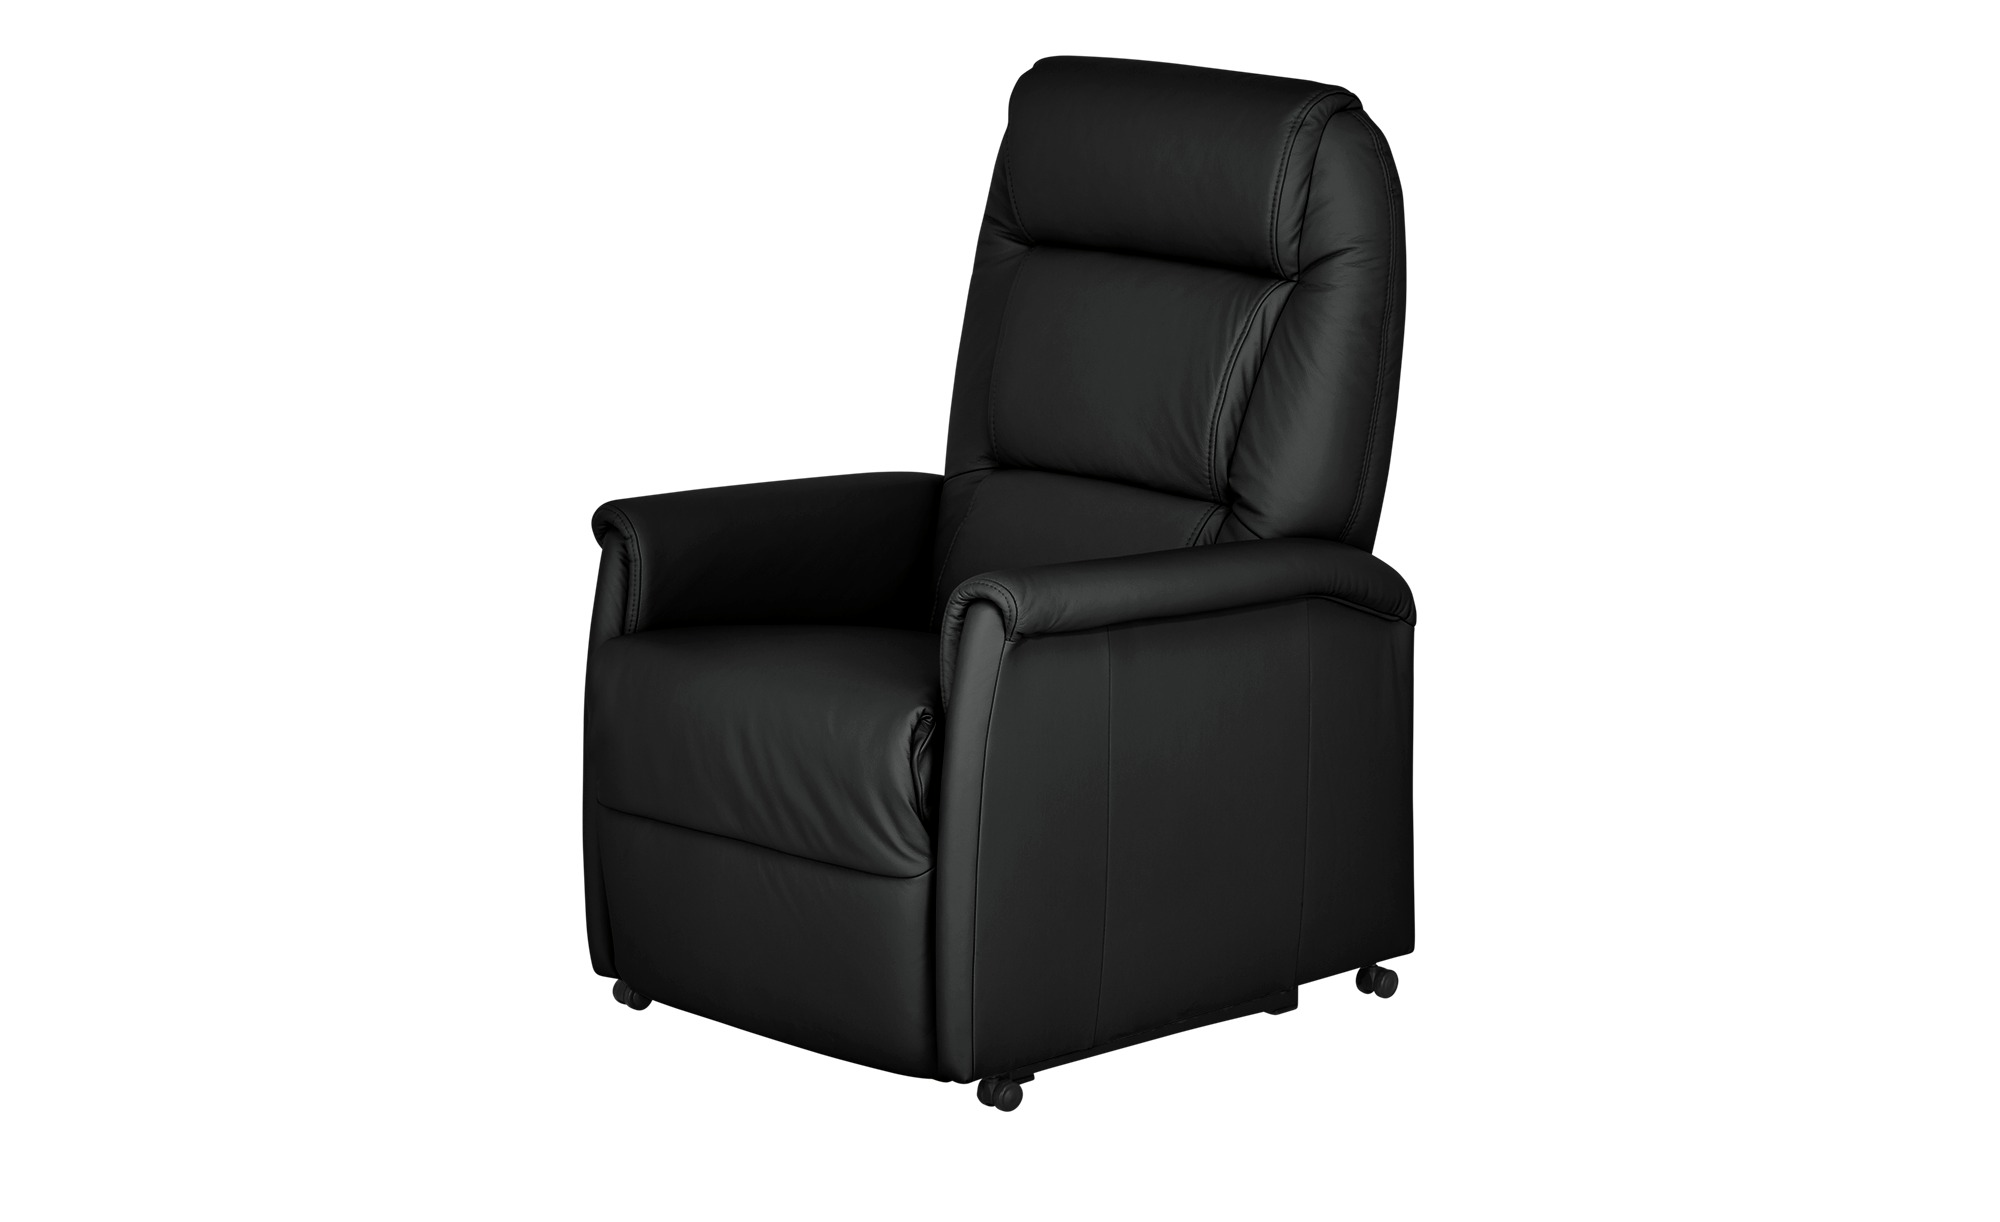 himolla Fernsehsessel  9773 - schwarz - 74 cm - 110 cm - 85 cm - Polstermöbel > Sessel > Fernsehsessel - Möbel Kraft | Wohnzimmer > Sessel > Fernsehsessel | himolla